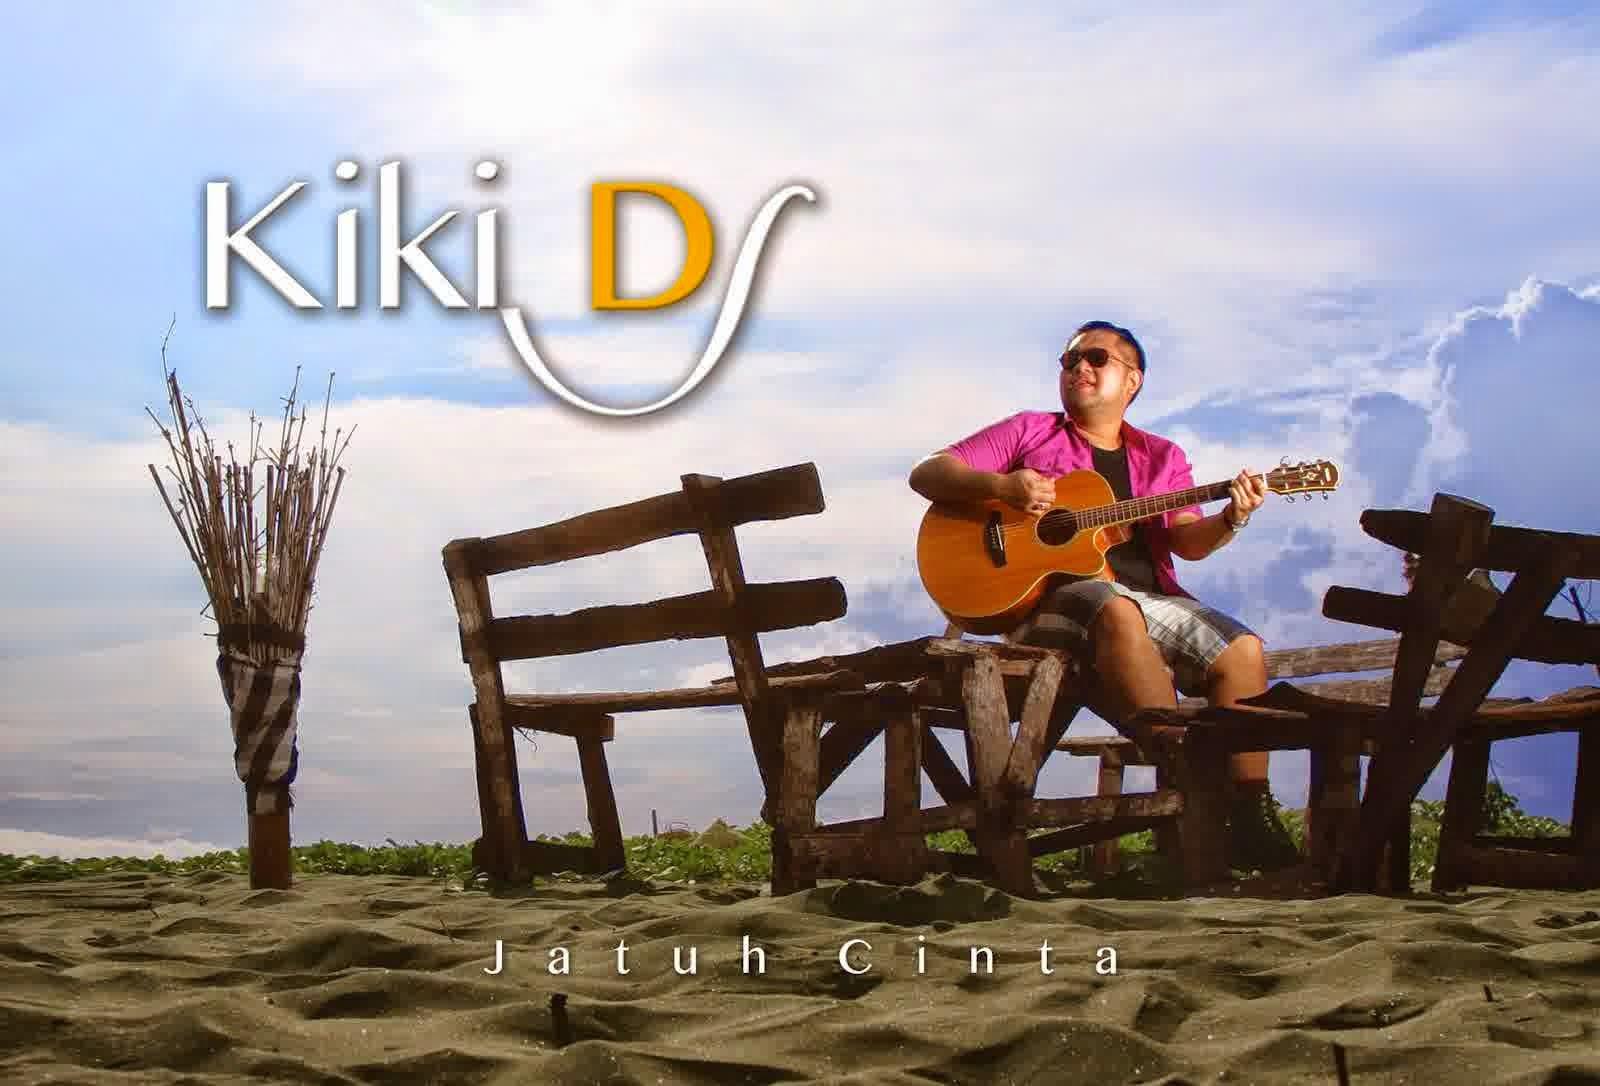 Kiki DJ - Jatuh Cinta